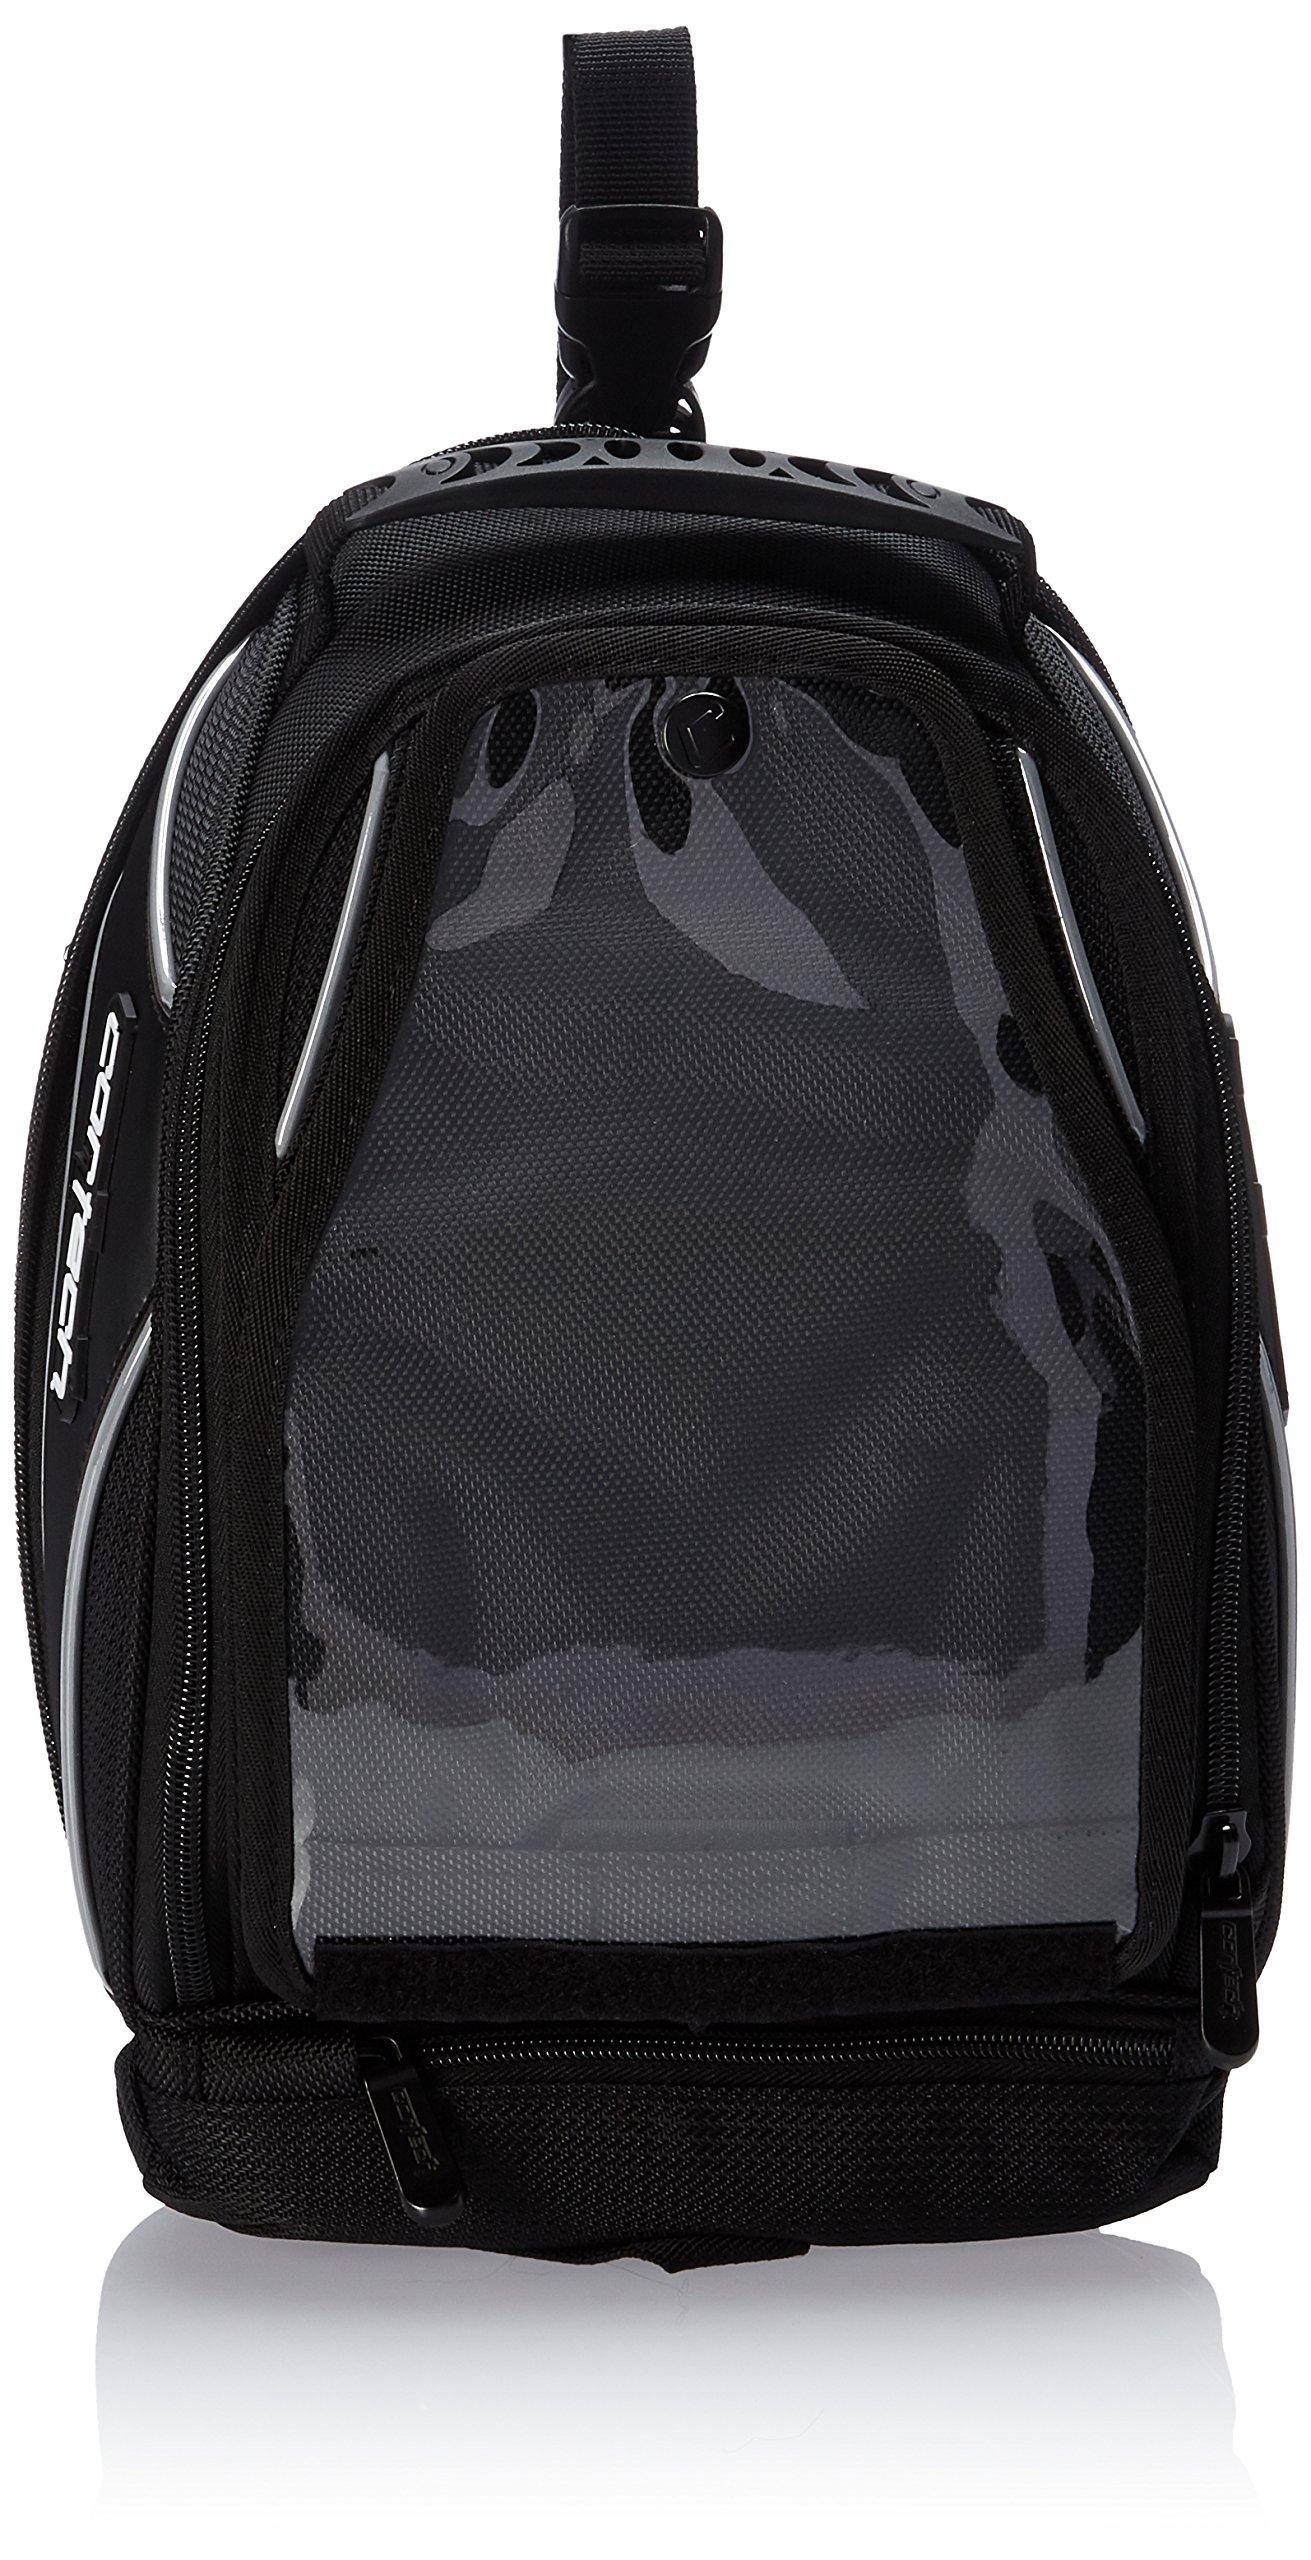 Cortech Super 8230-0605-10 2.0 Black Low Profile Motorcycle Tank Bag Strap Mount